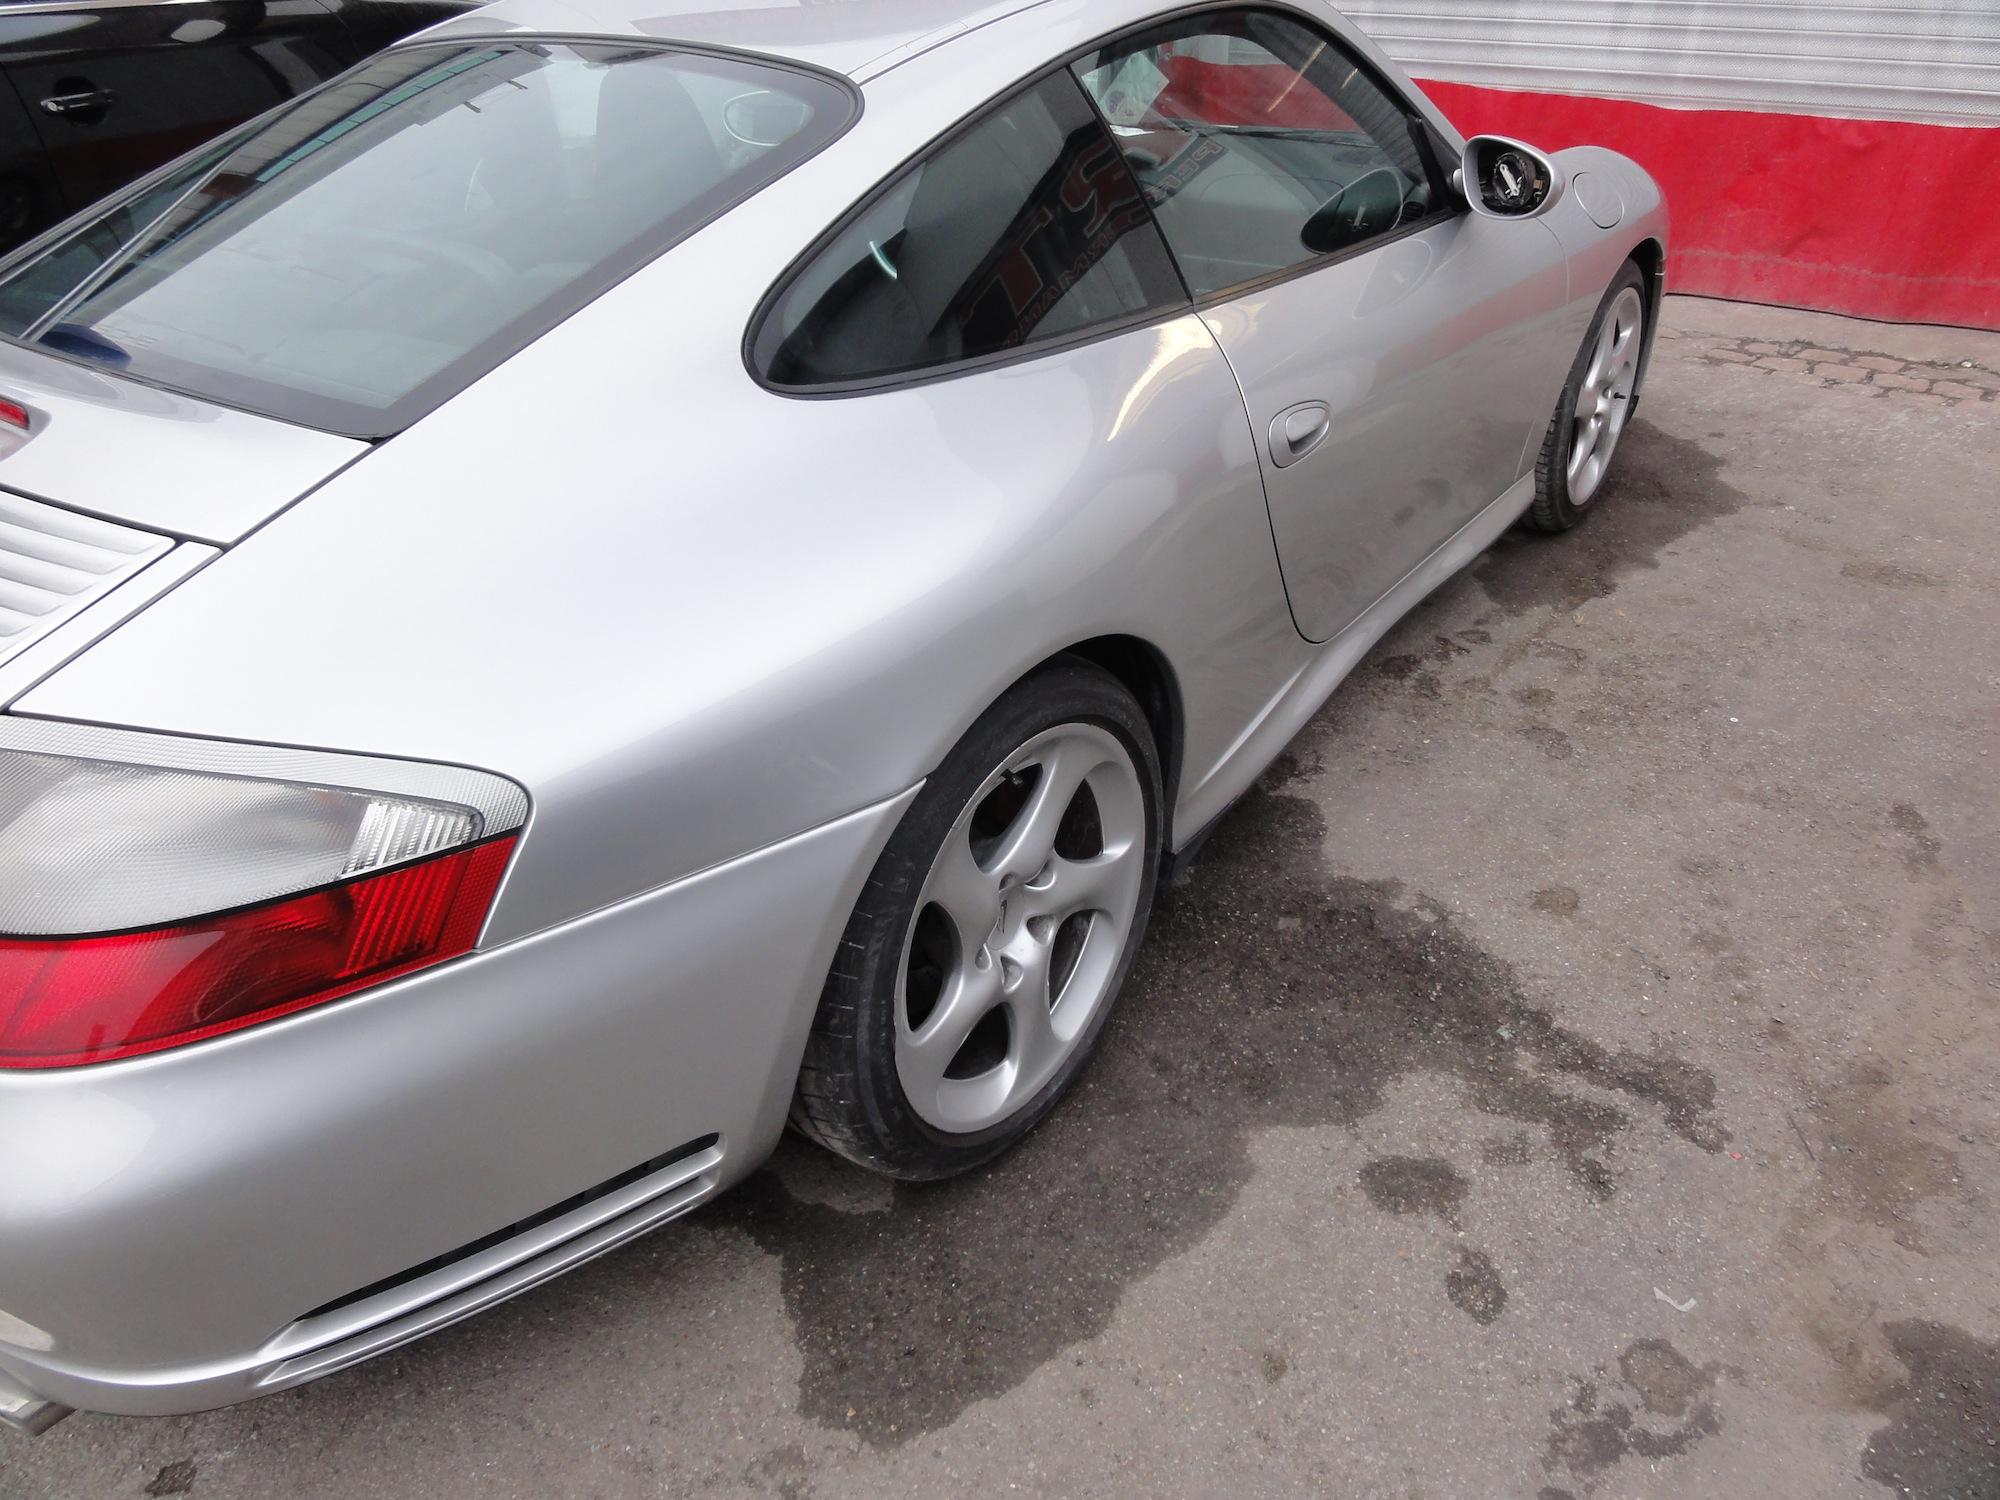 Porsche-996-side-repair-4